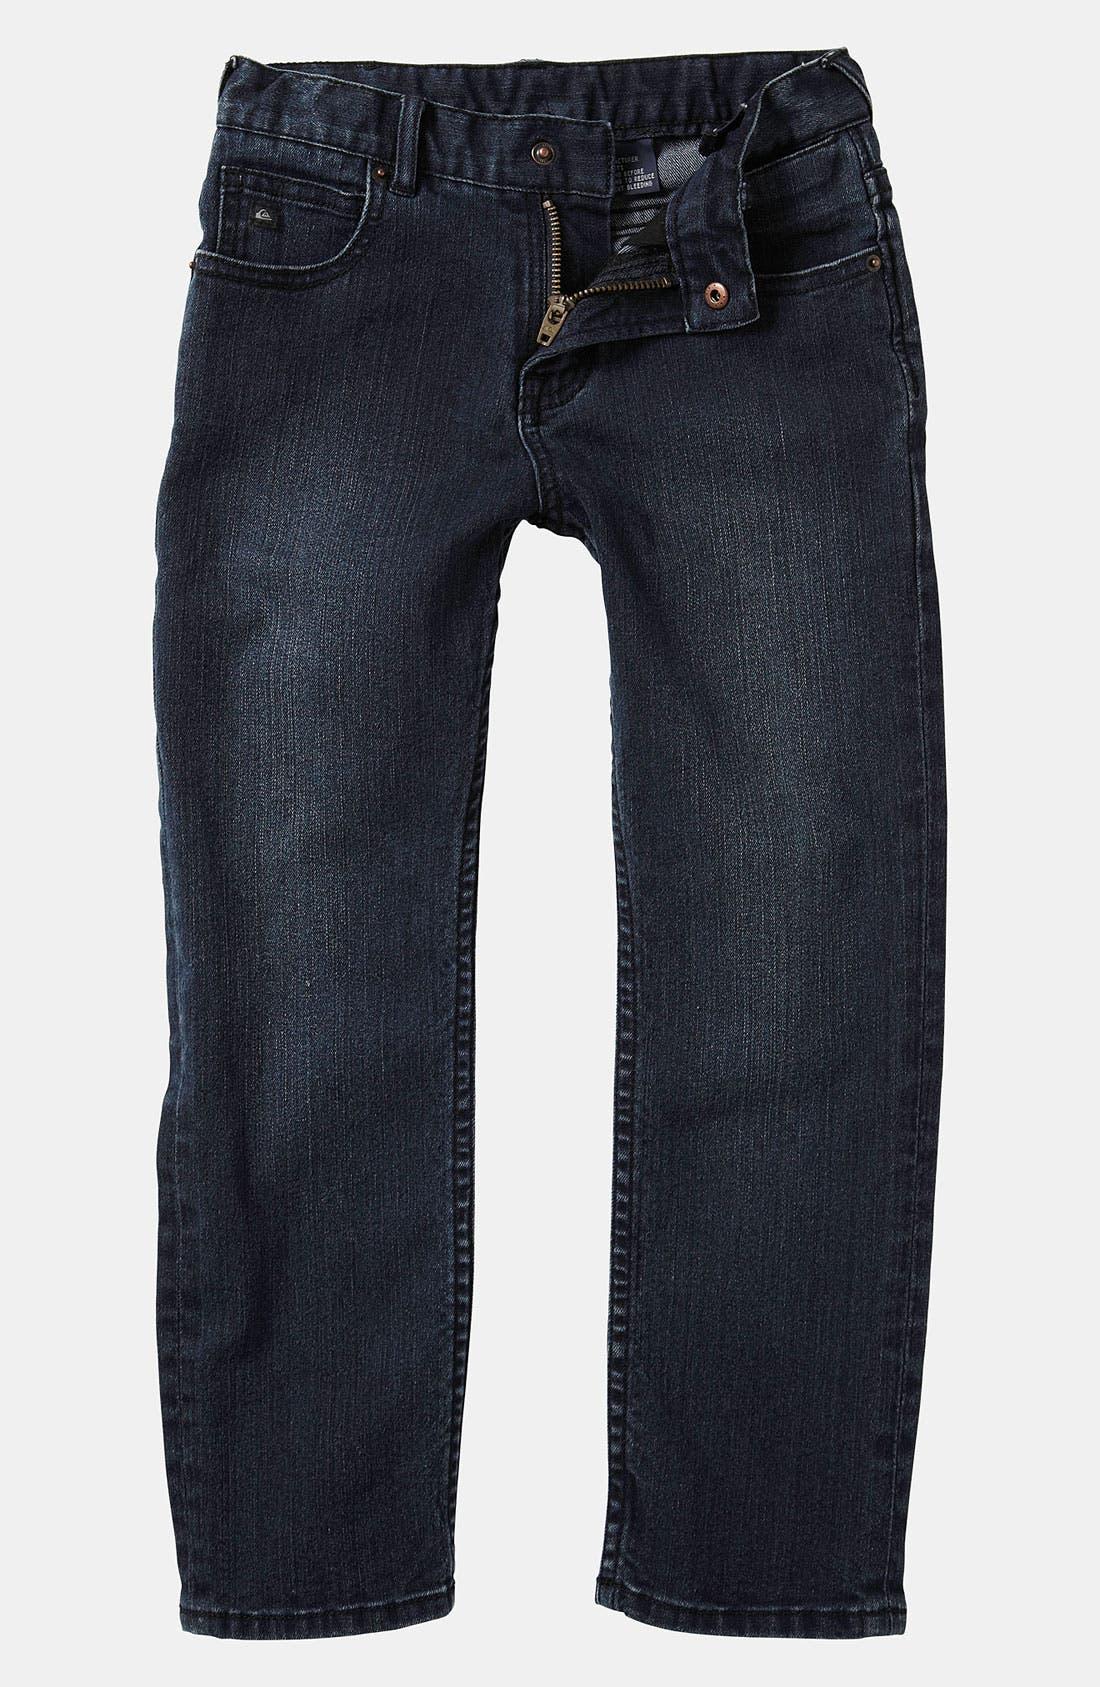 Main Image - Quiksilver 'Distortion' Jeans (Infant)